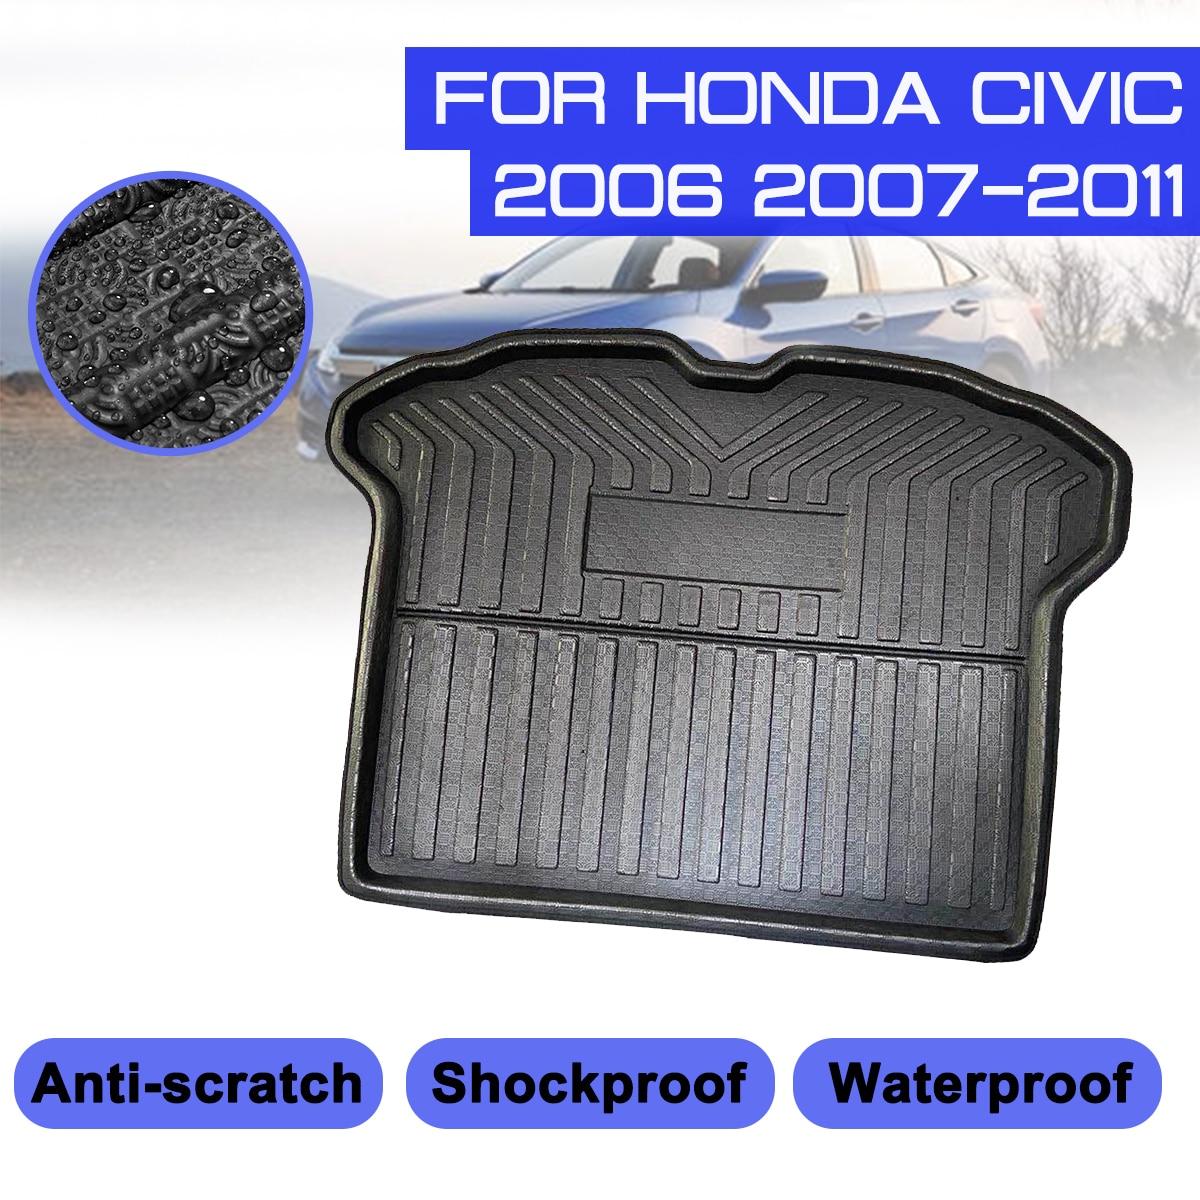 For Honda Civic 2006 2007 2008 2009 2010 2011 Car Floor Mat Carpet Rear Trunk Anti mud Cover|Floor Mats| |  - title=